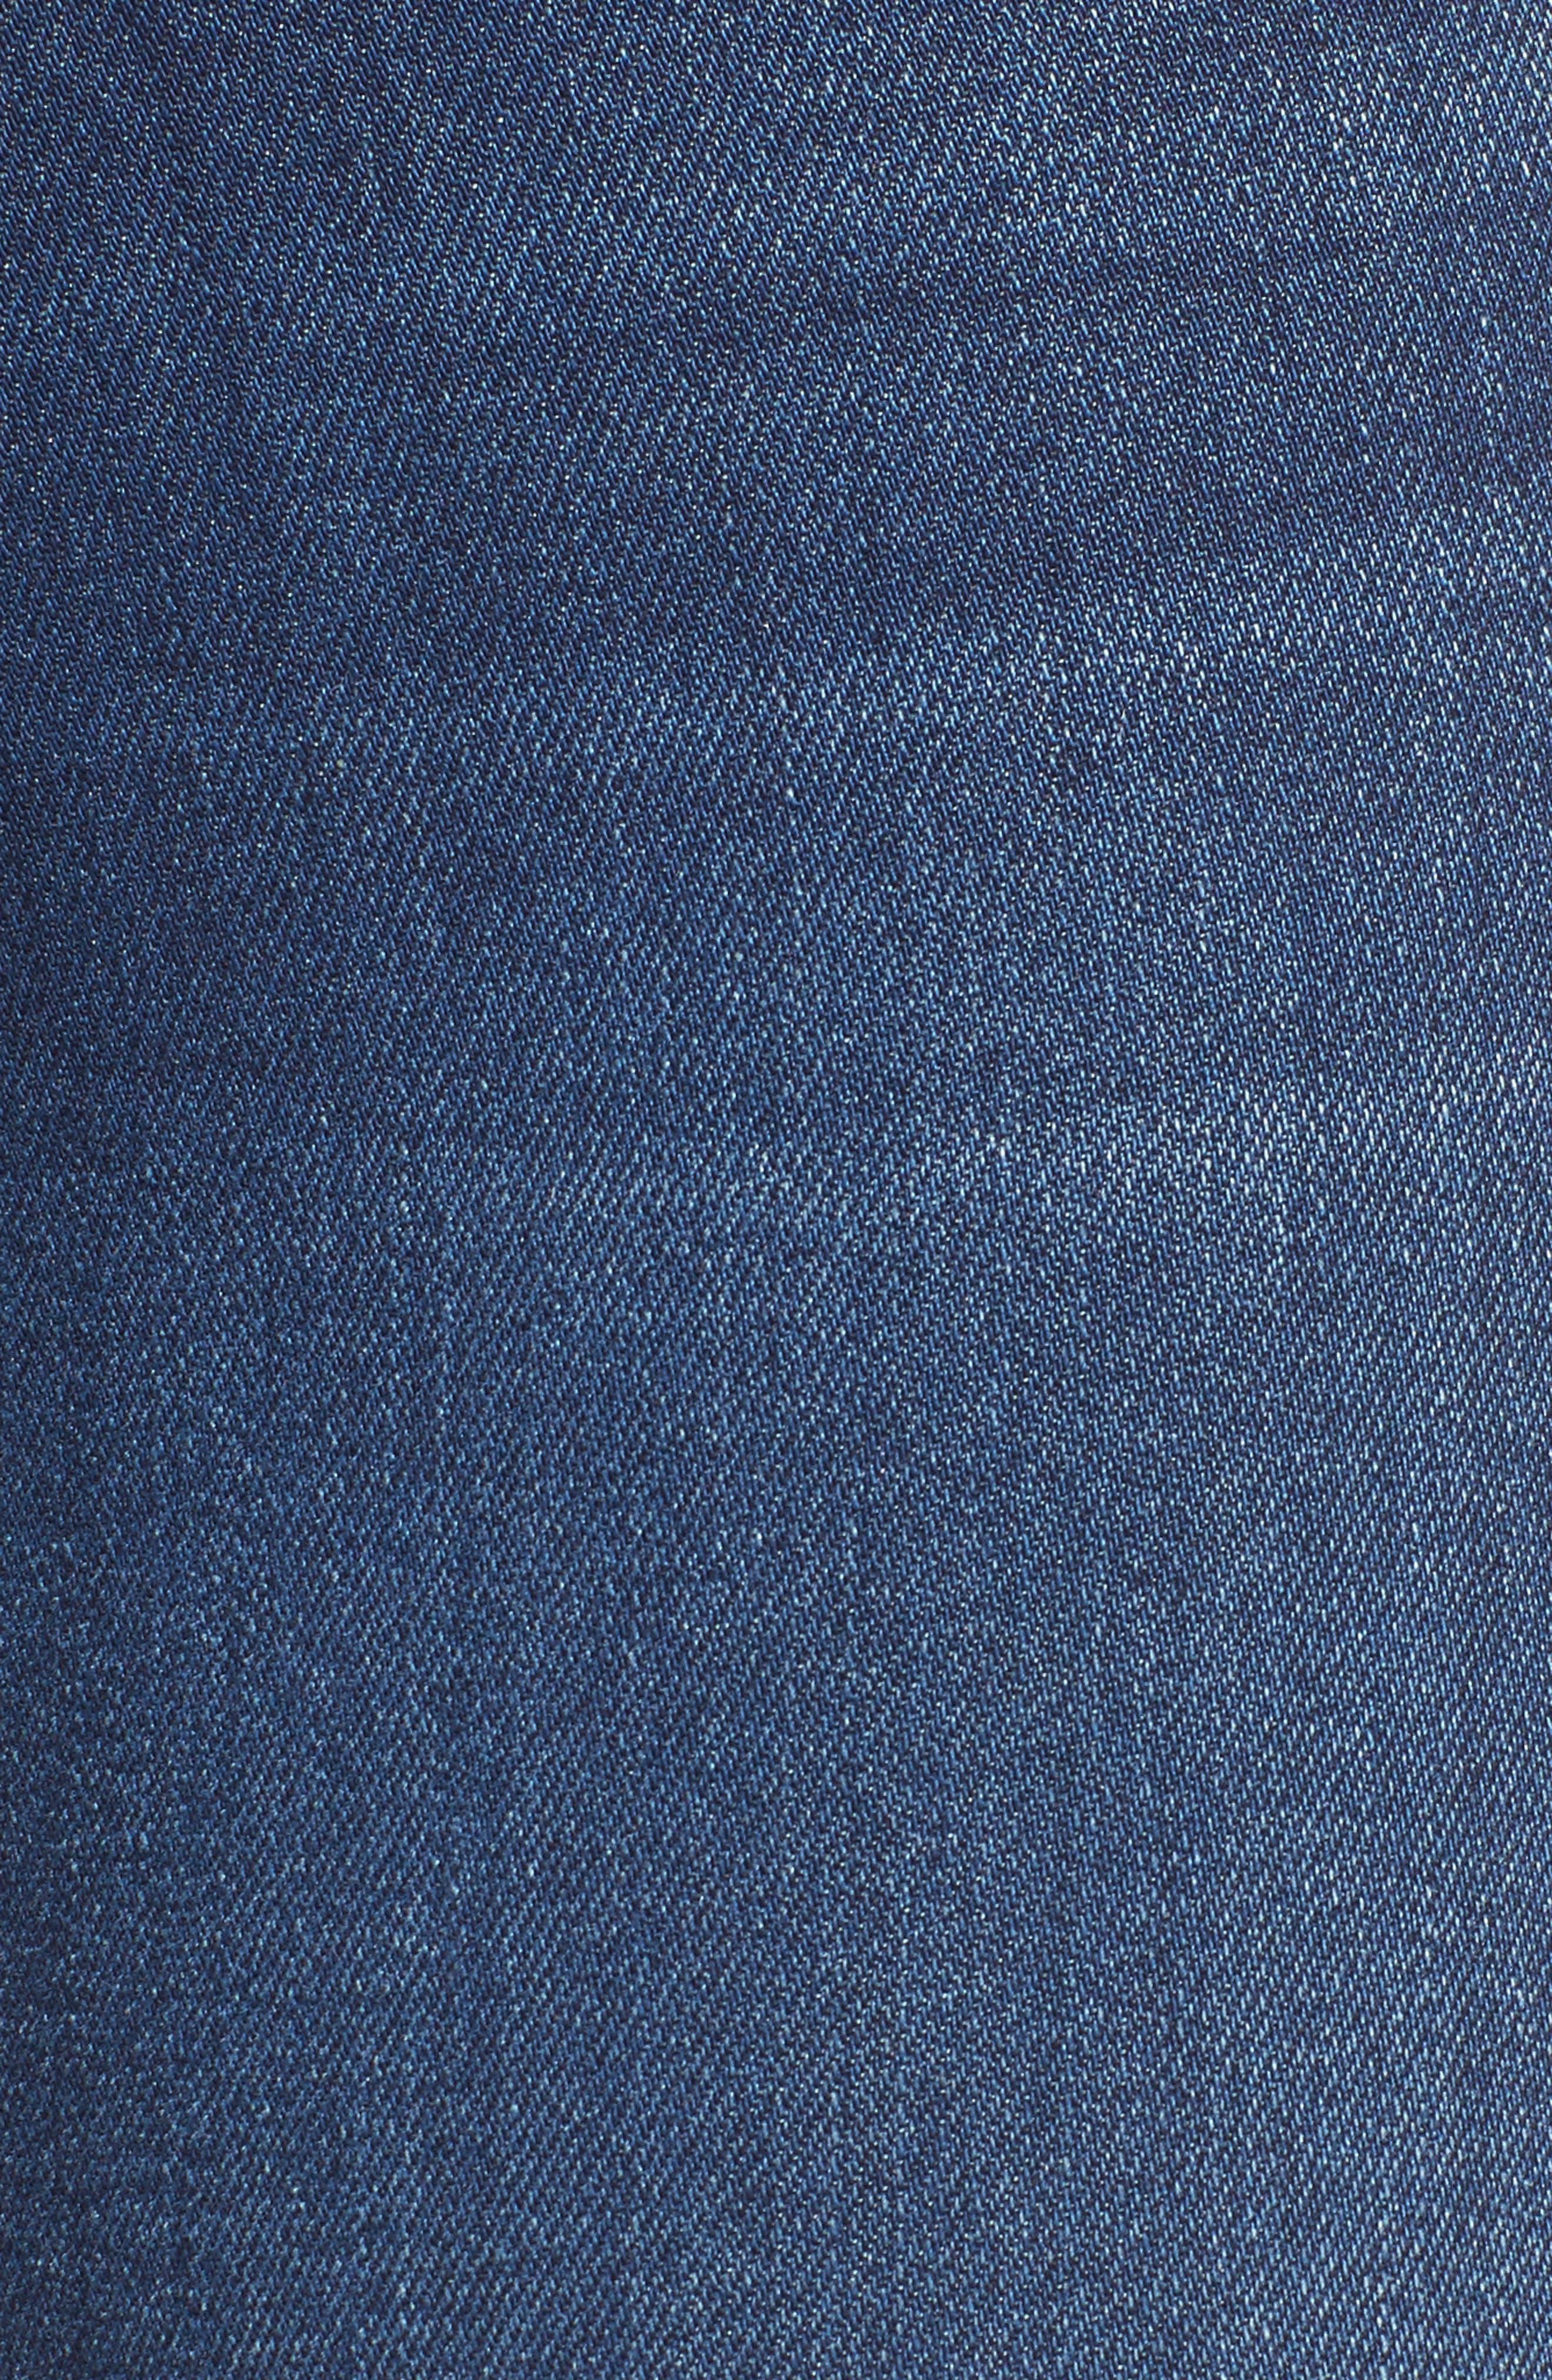 Hudson Nico Mid Rise Super Skinny Jeans,                             Alternate thumbnail 6, color,                             420